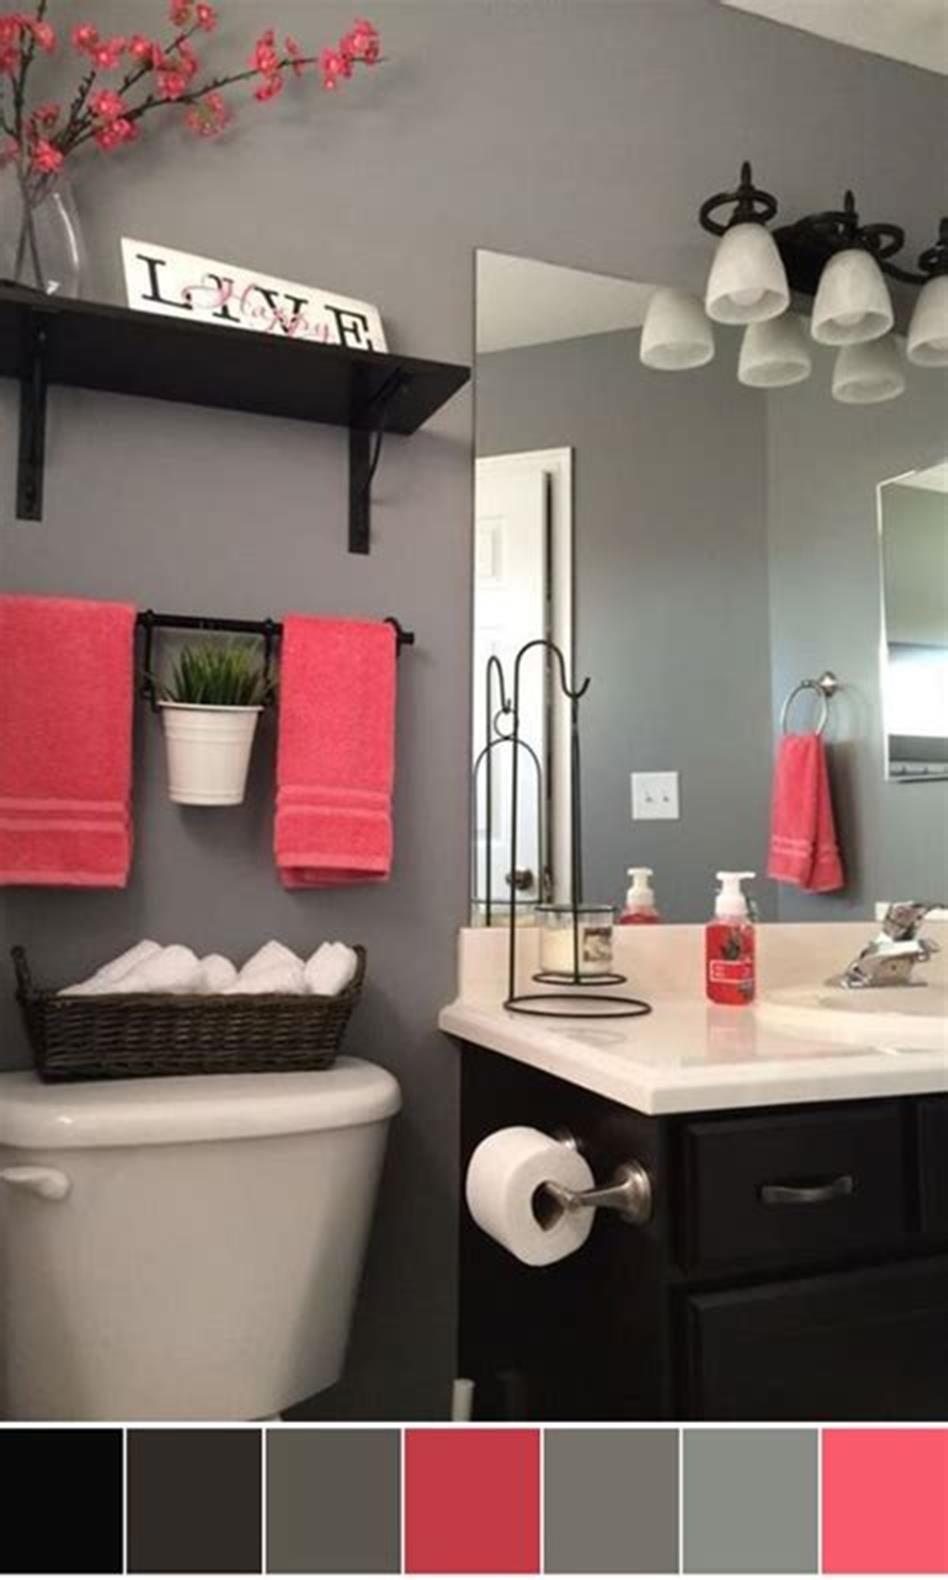 38 Best Bathroom Color Scheme Ideas For 2020 In 2020 Bathroom